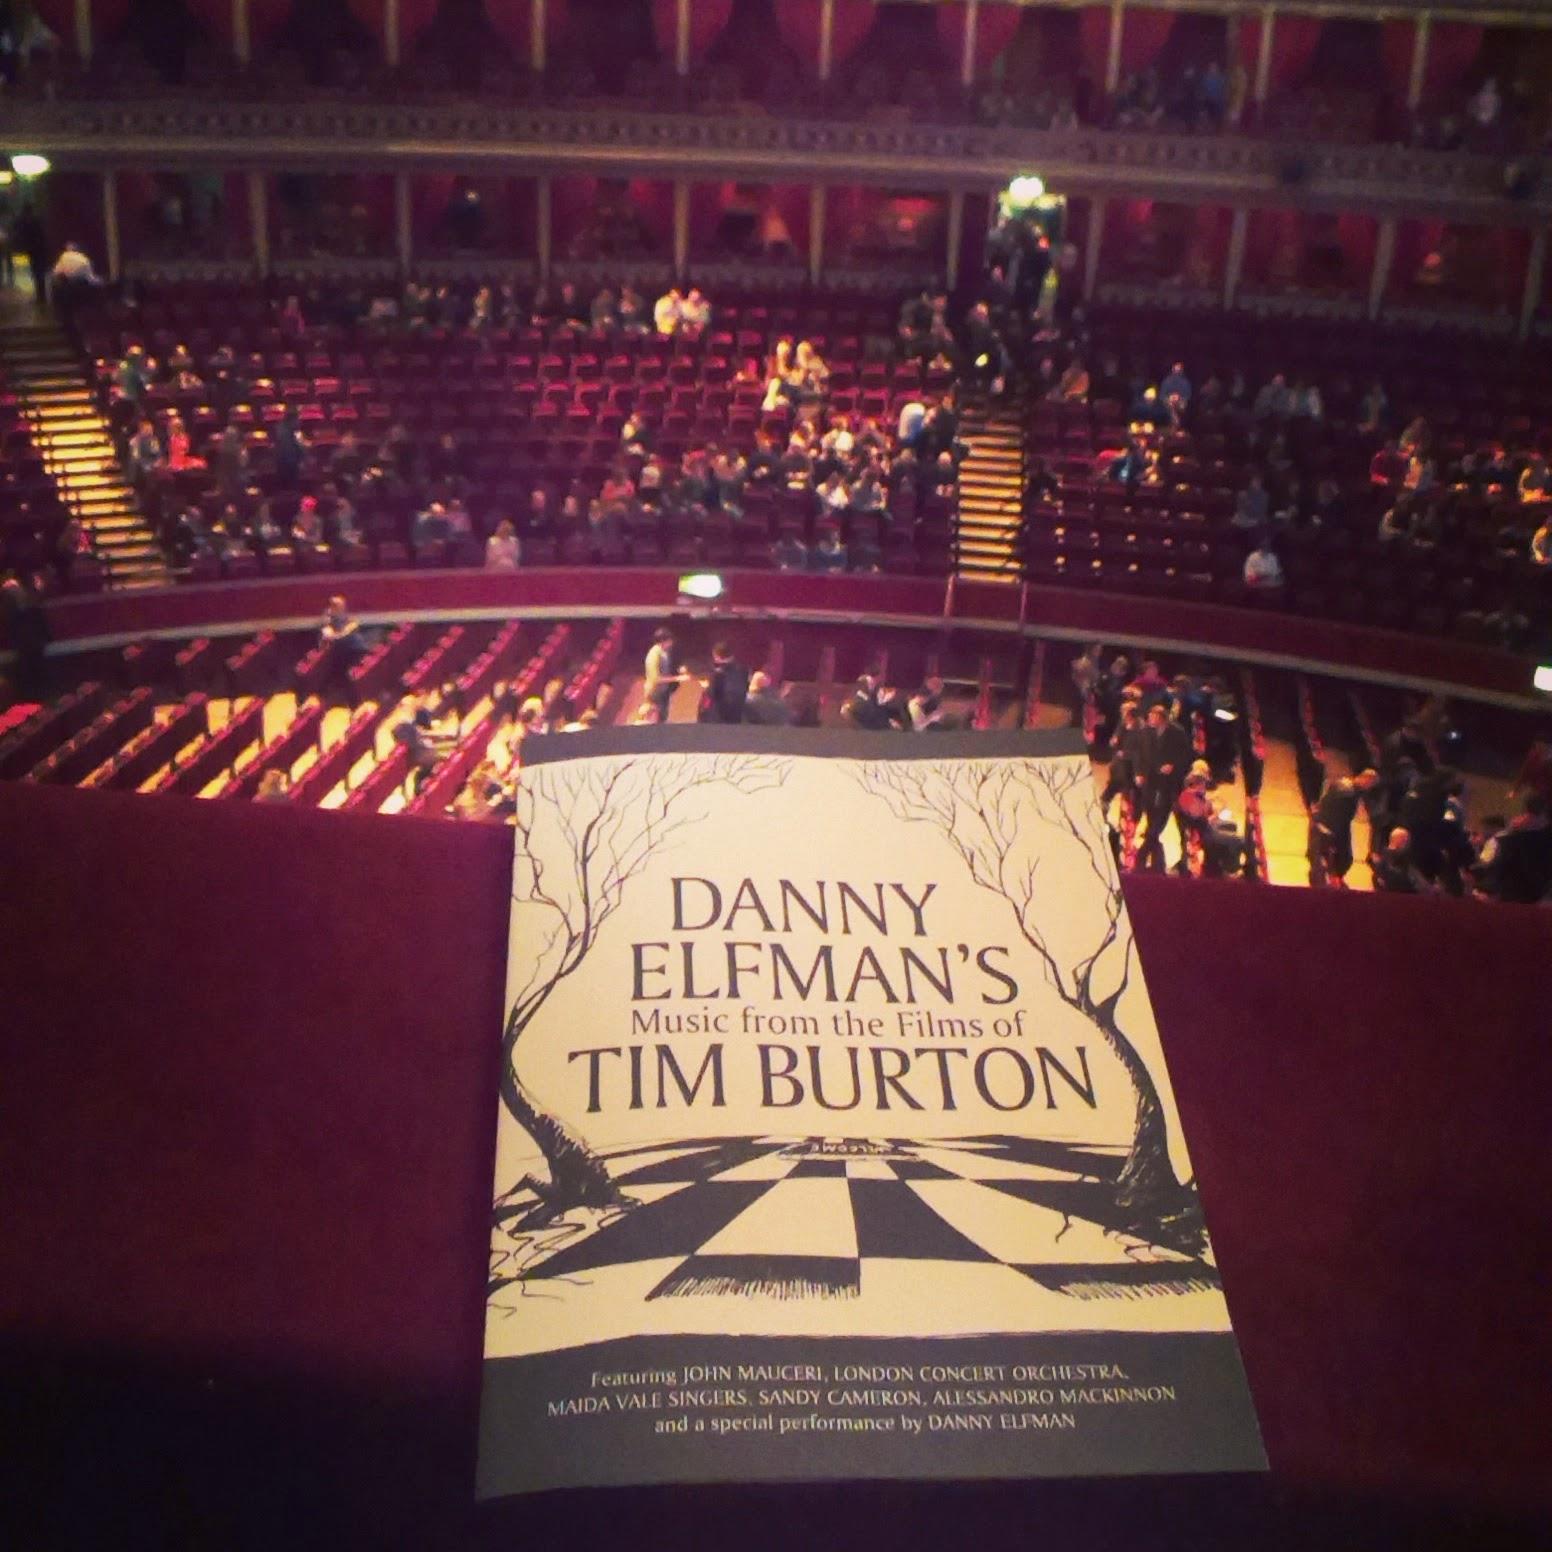 Royal Albert Hall - Danny Elfman's Music from the films of Tim Burton